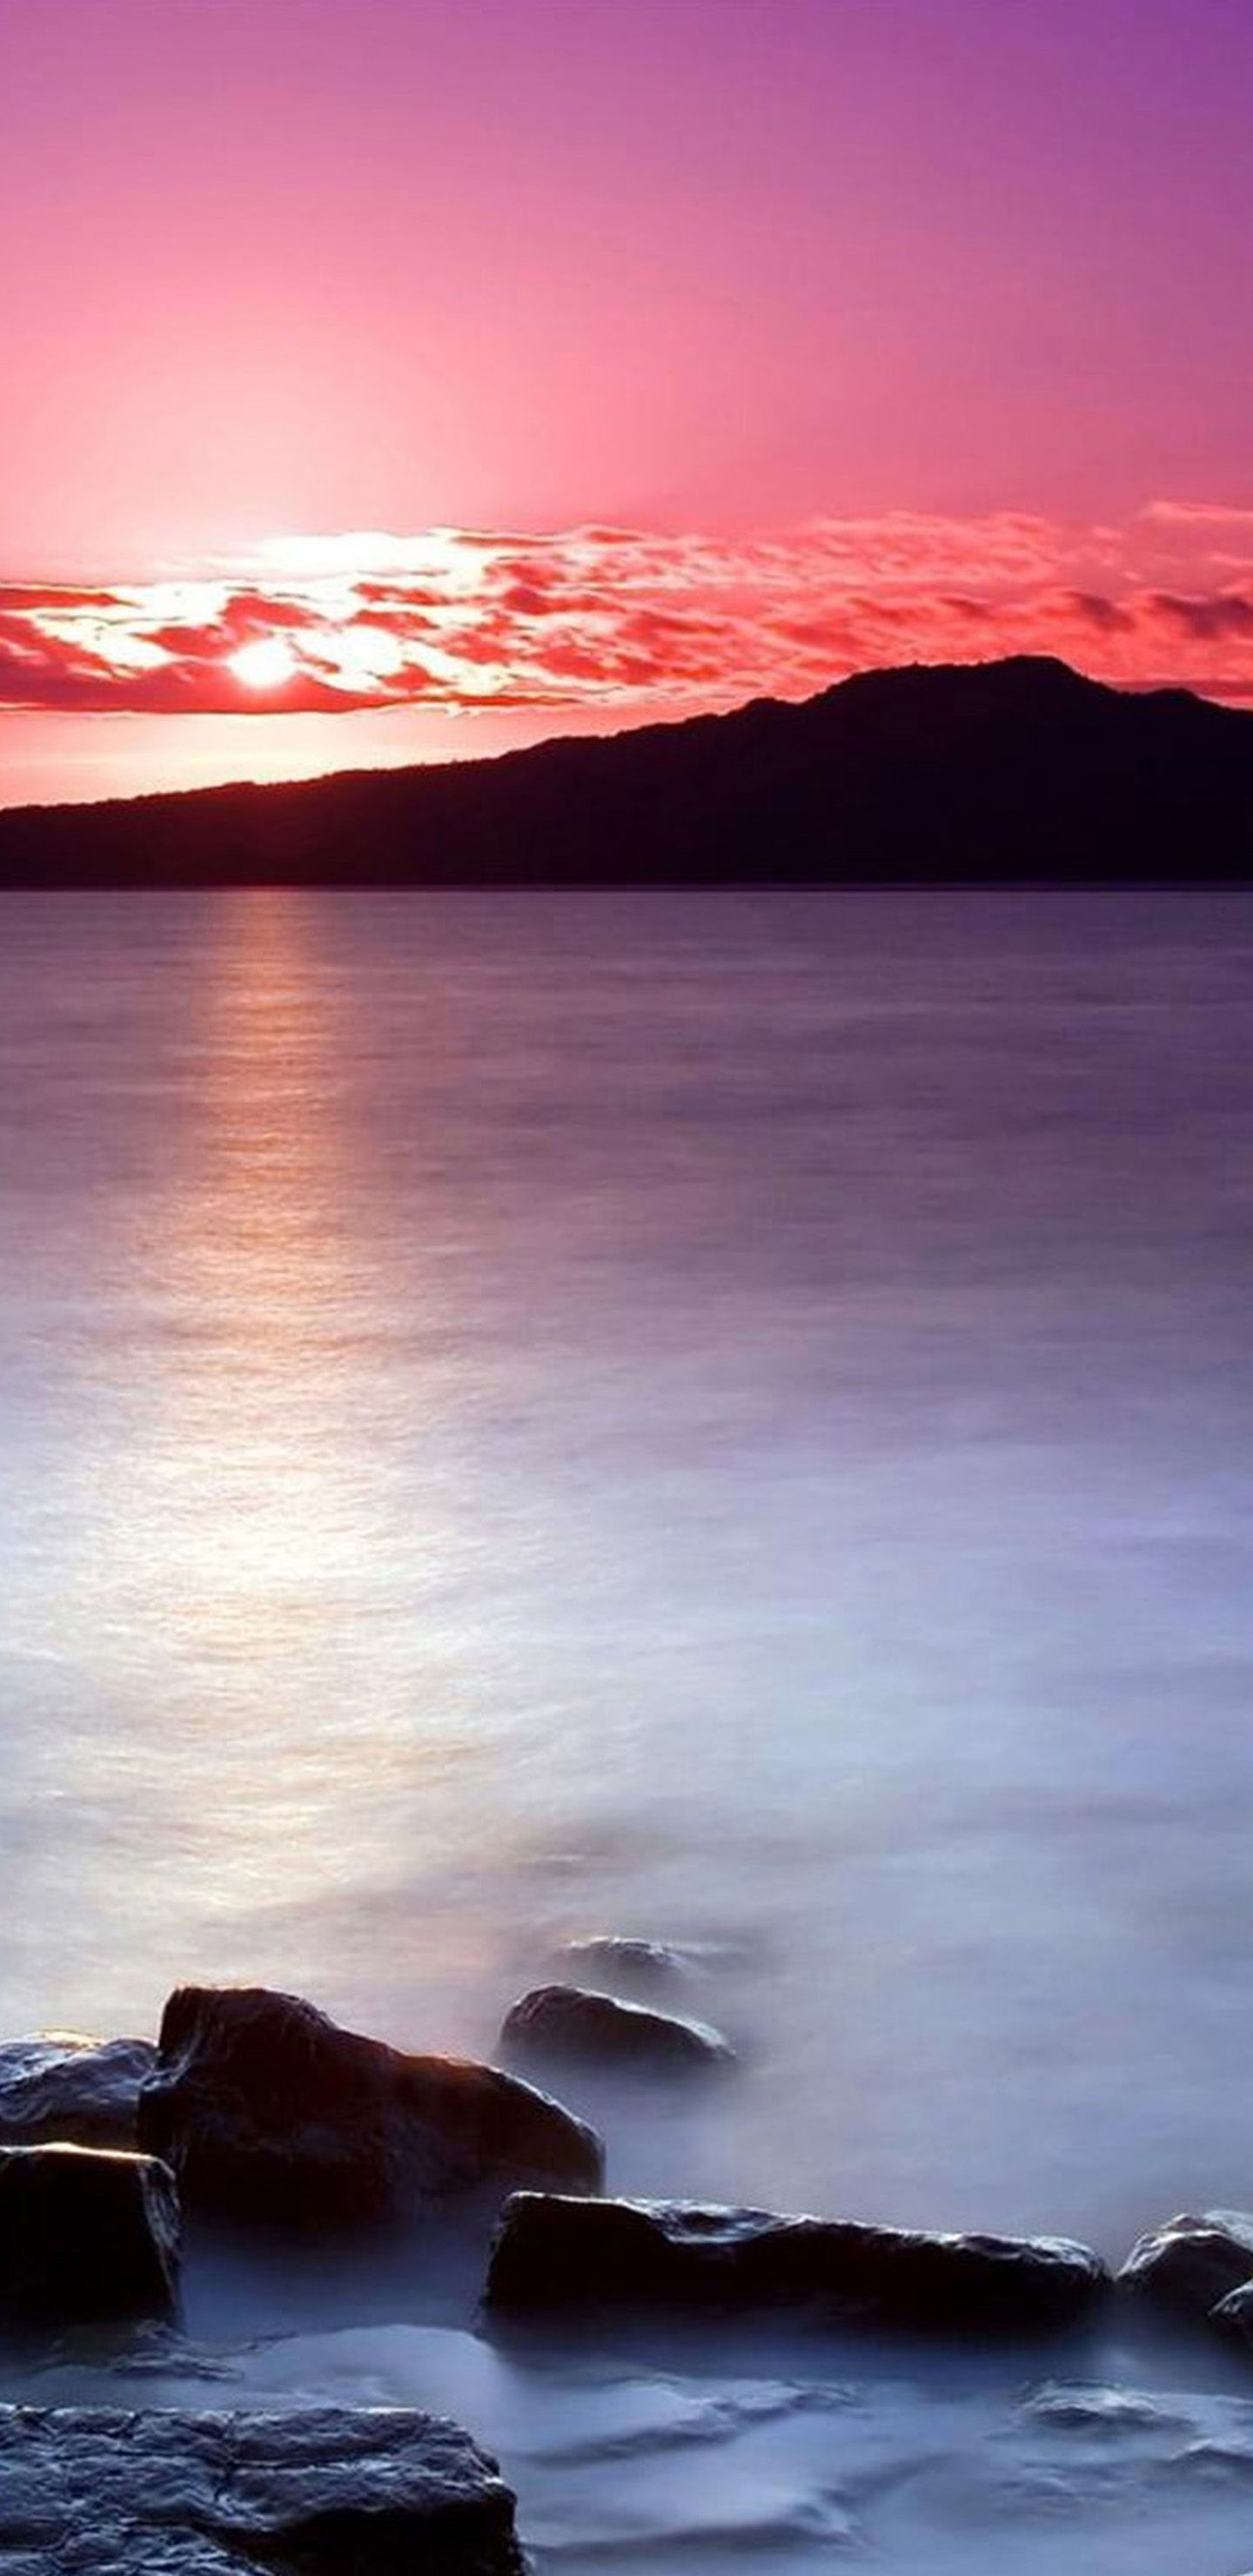 Beach Scenery Sunset Scenery Clouds Landscape